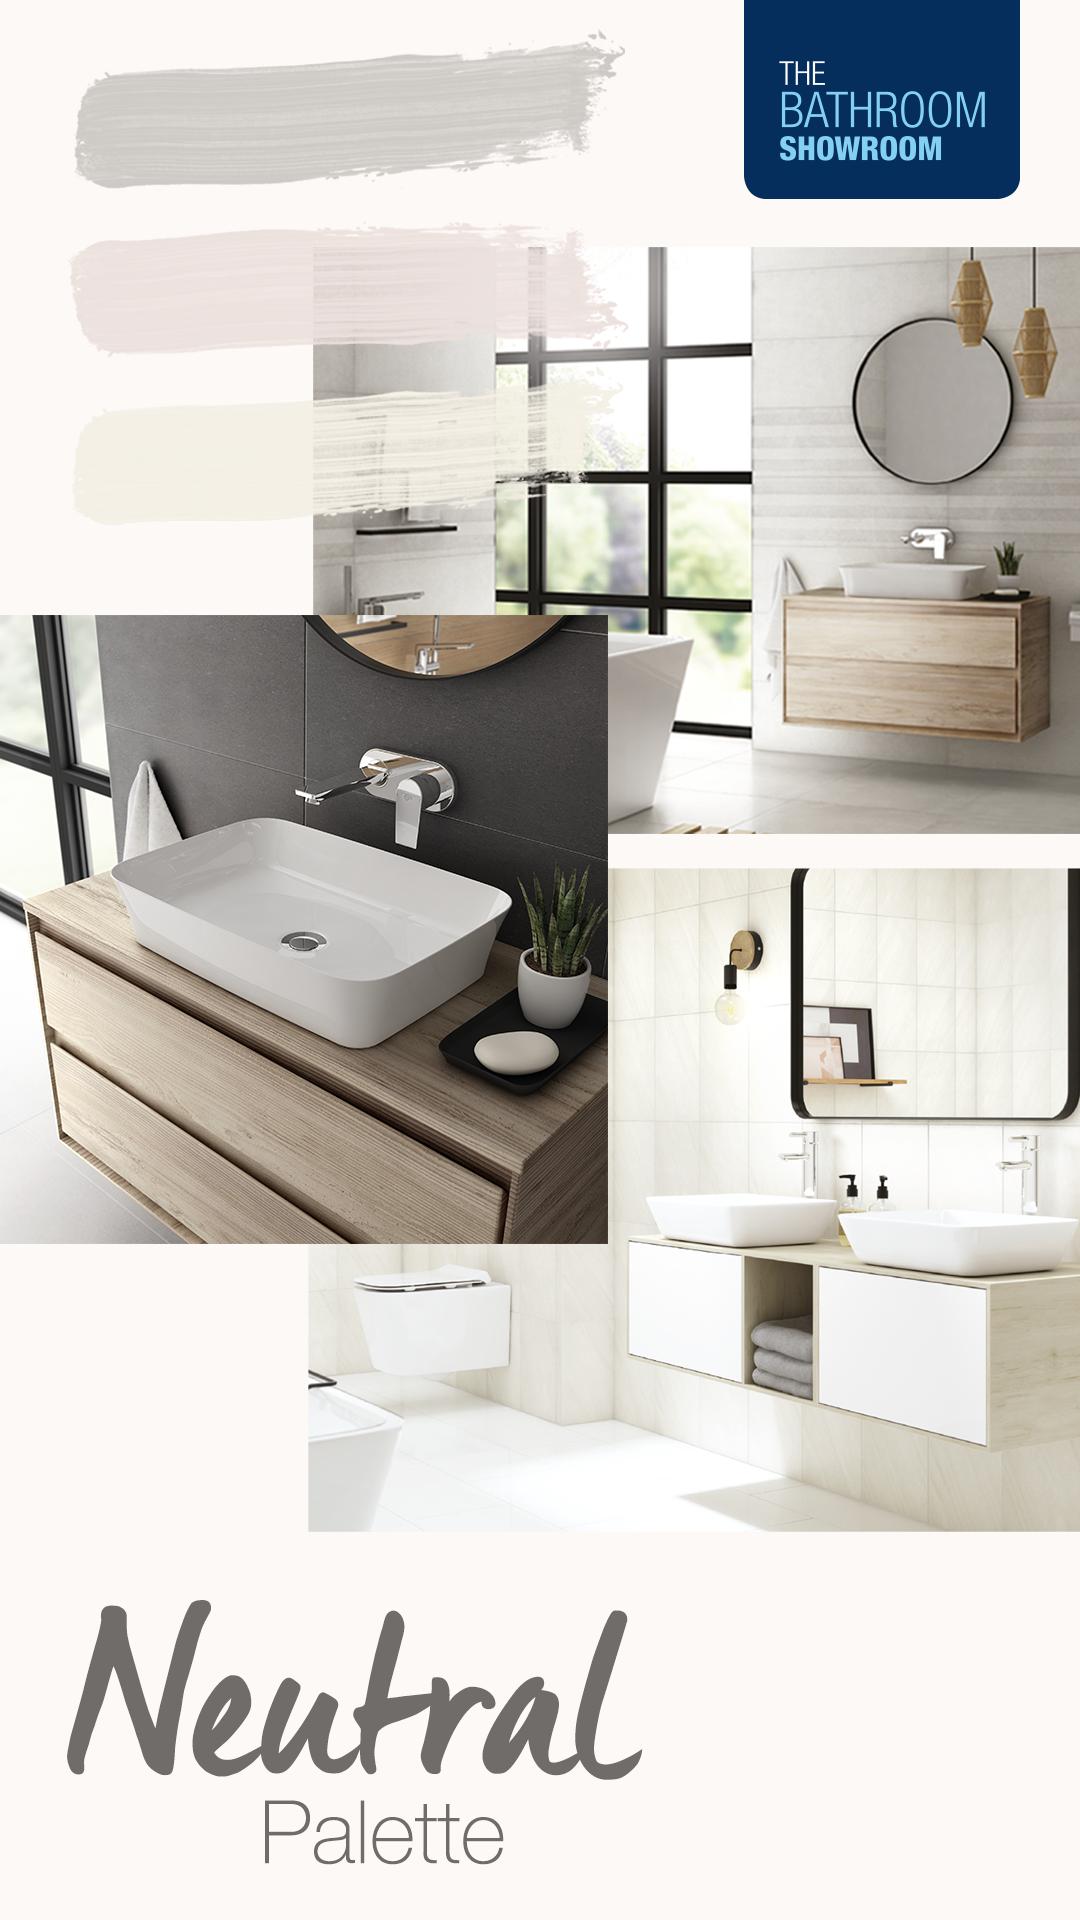 Neutral Palette Mood Board Latest Bathroom Trends Bathroom Showrooms Bathroom Trends